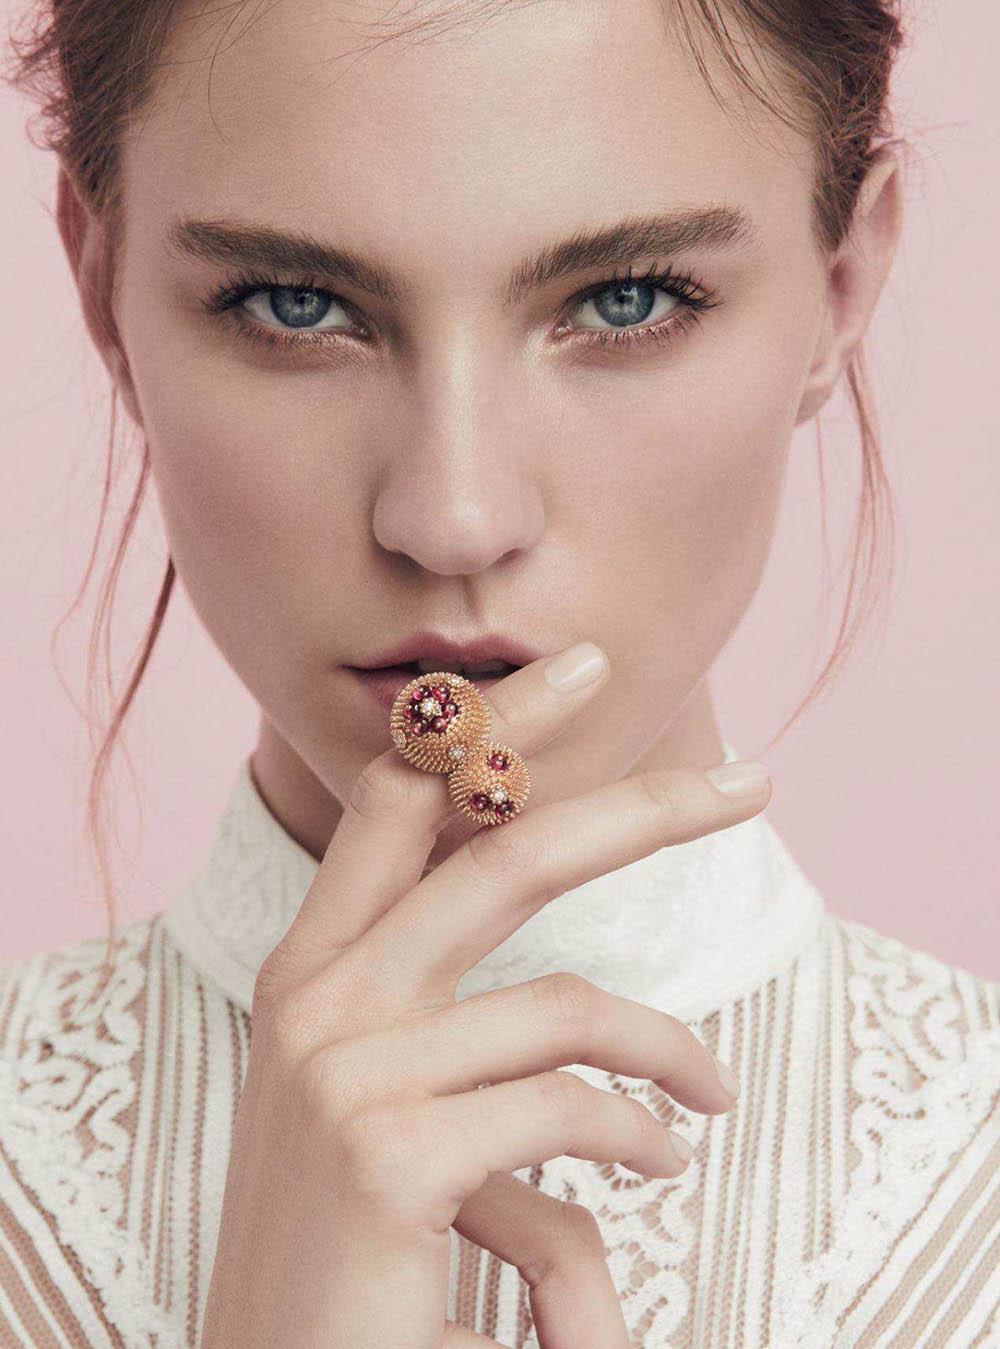 Nicole Pollard by Lara Jade for Harper's Bazaar UK July 2018